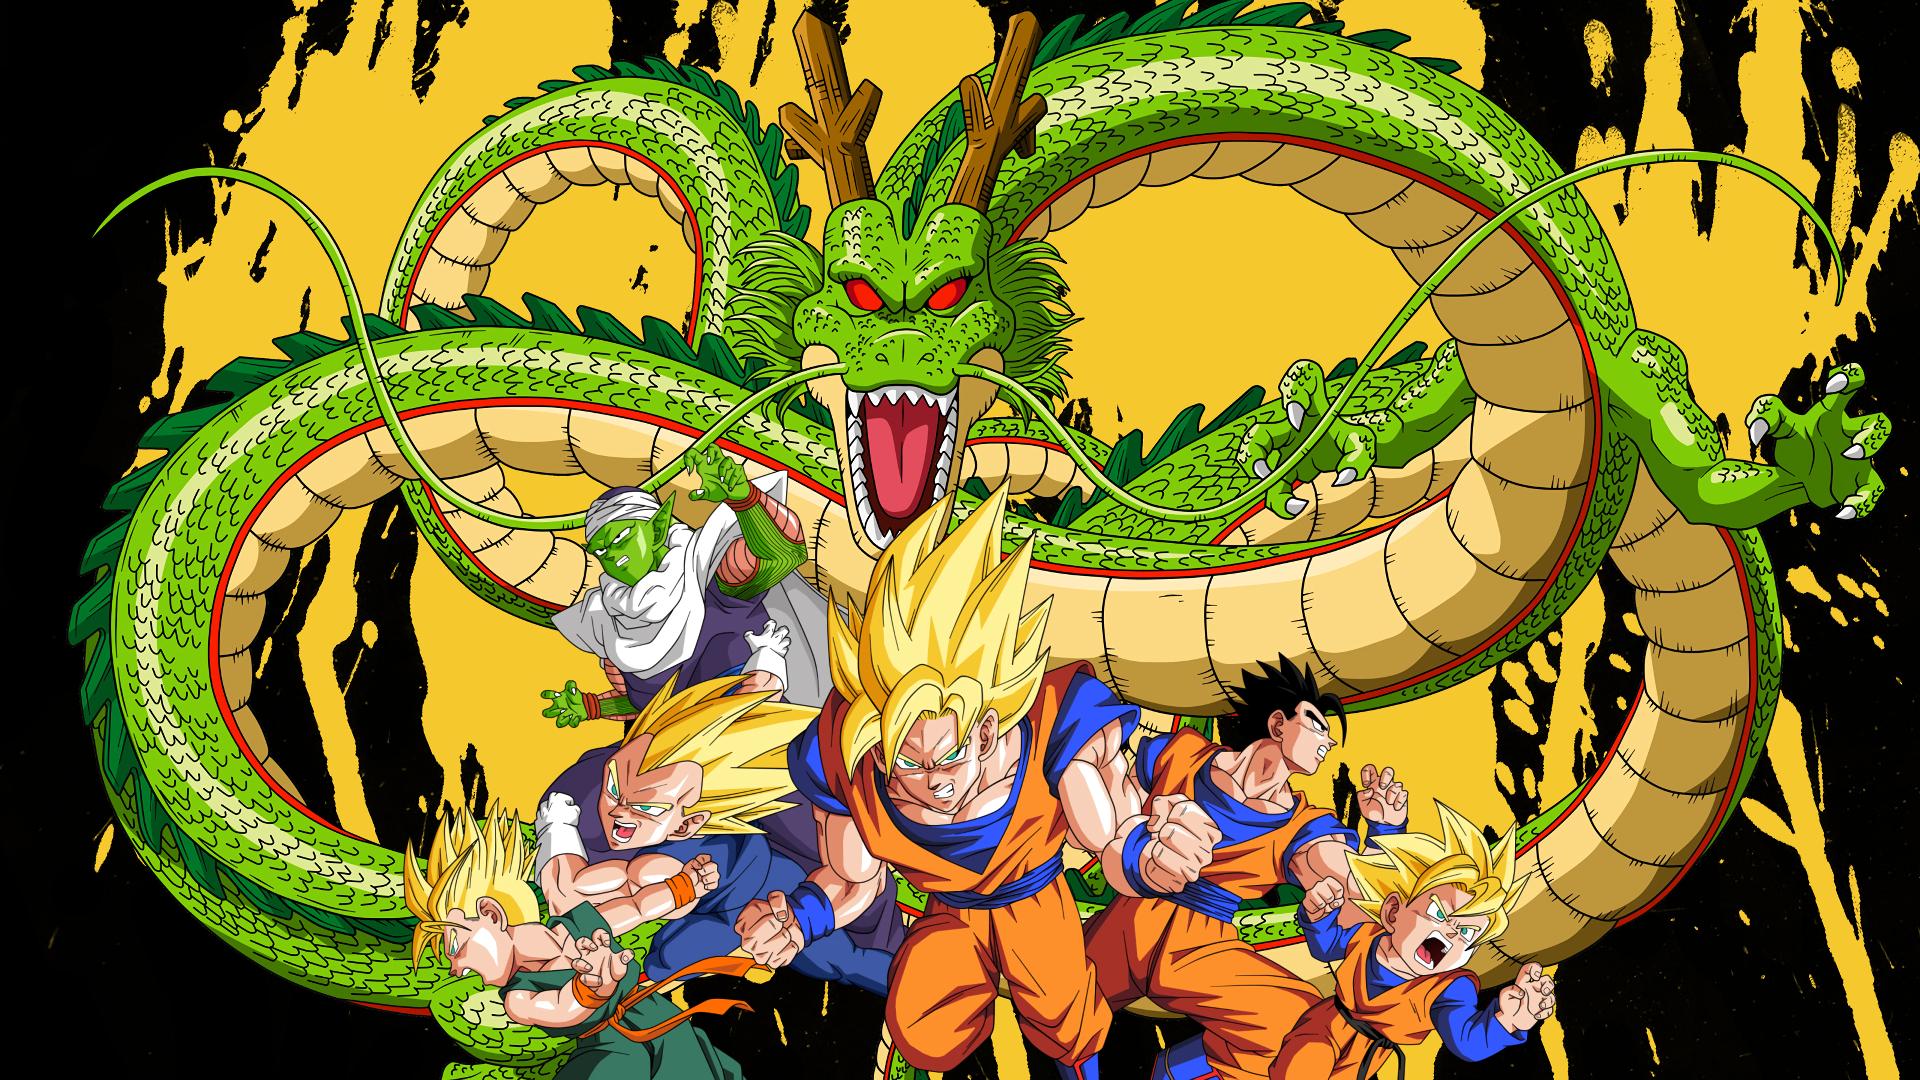 Dragon Ball Z Fond d'écran HD | Arrière-Plan | 1920x1080 | ID:739914 - Wallpaper Abyss